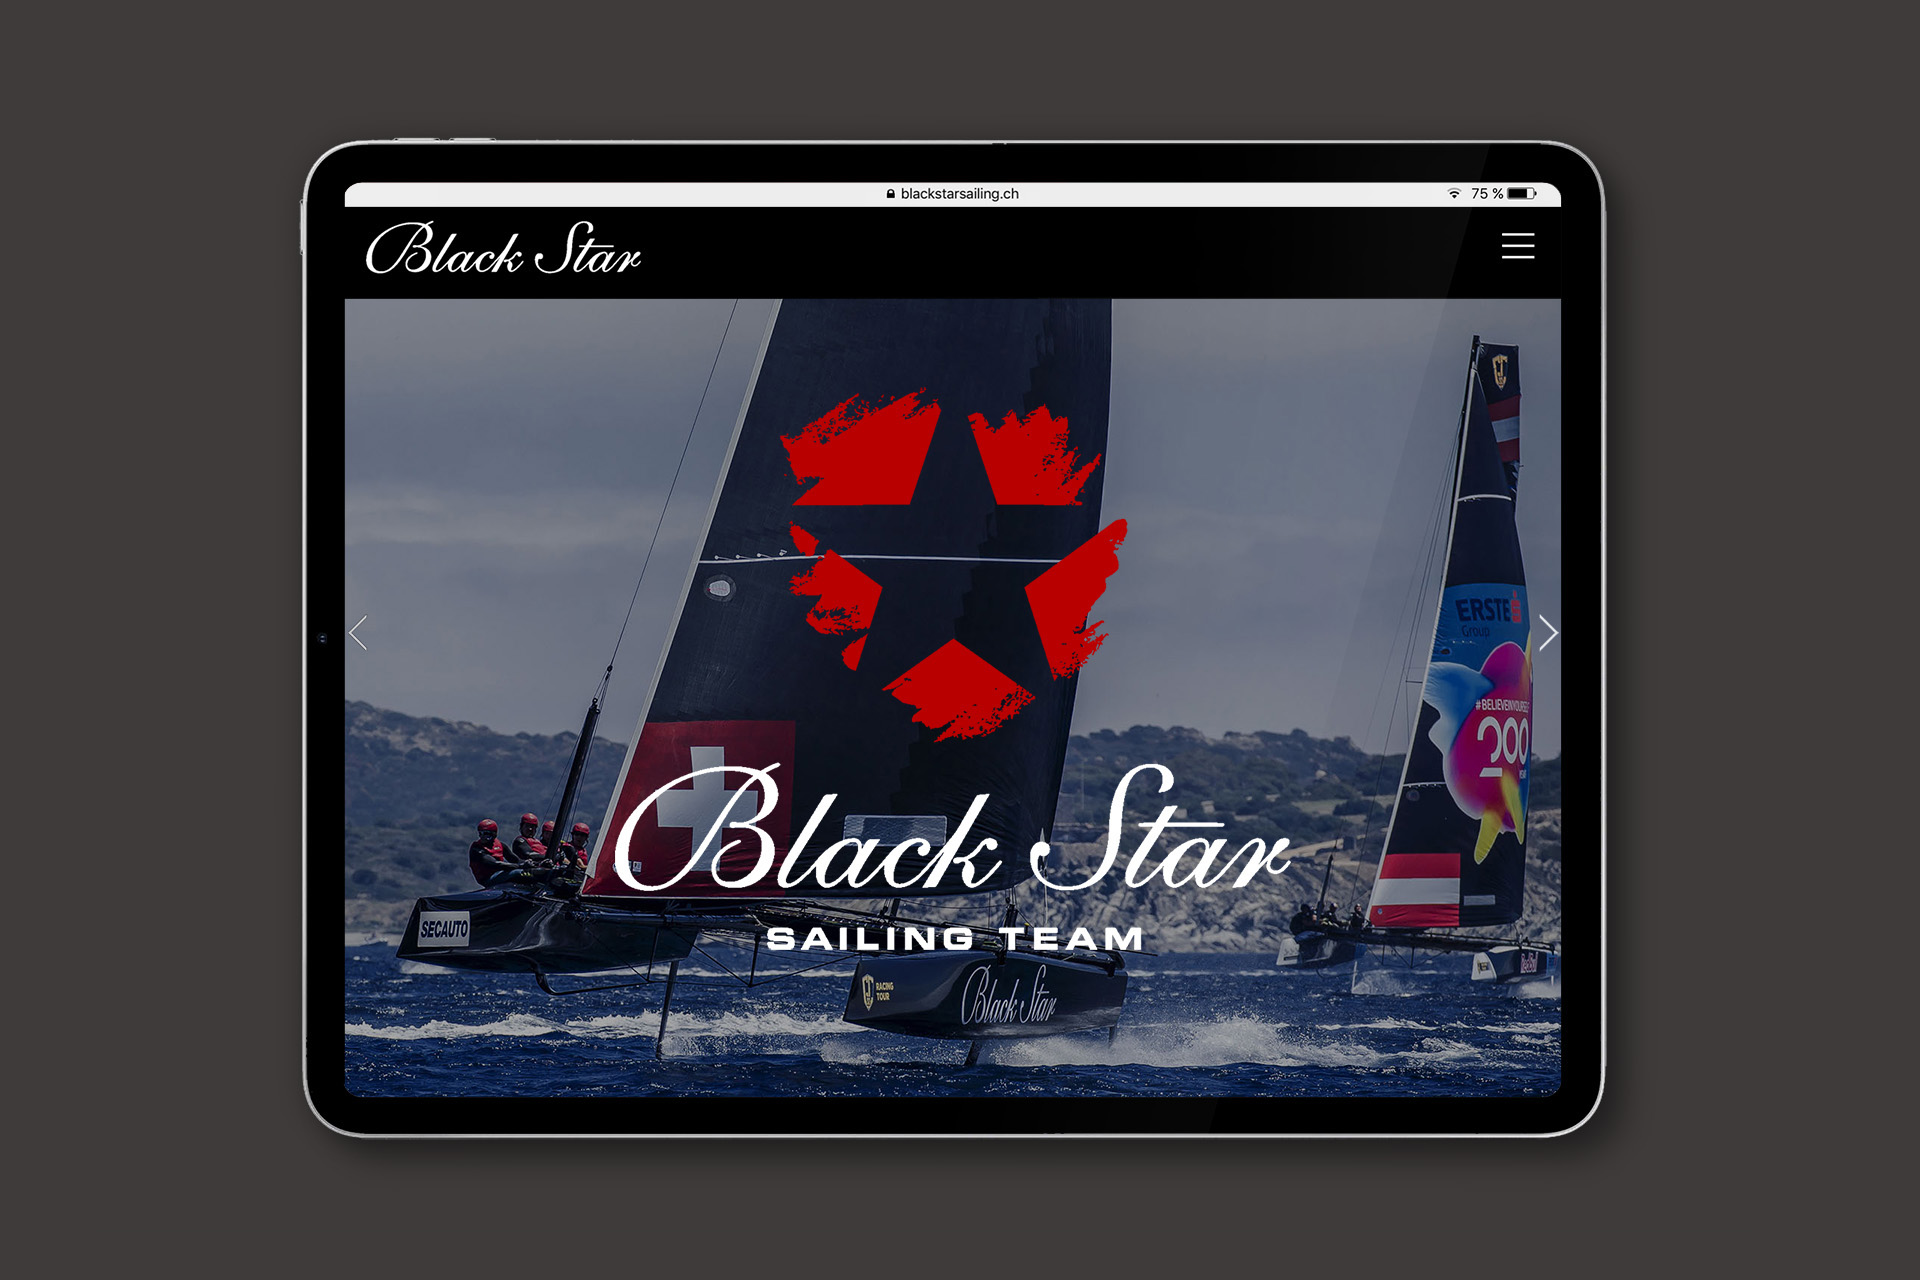 BlackStarSailing_iPad_05